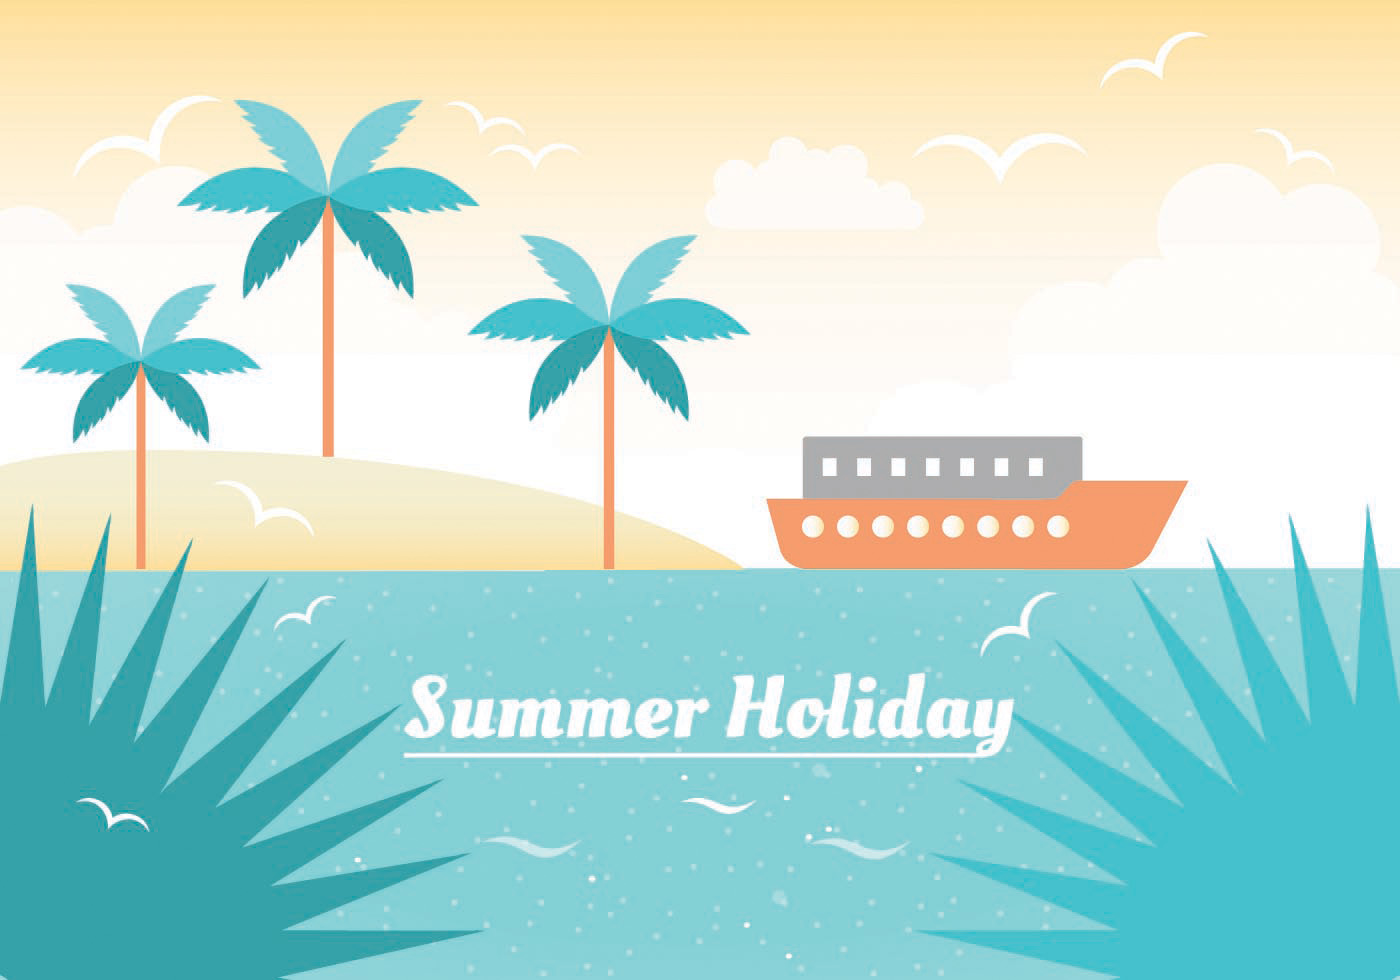 Free Summer Vacation Vector Illustration - Download Free ...